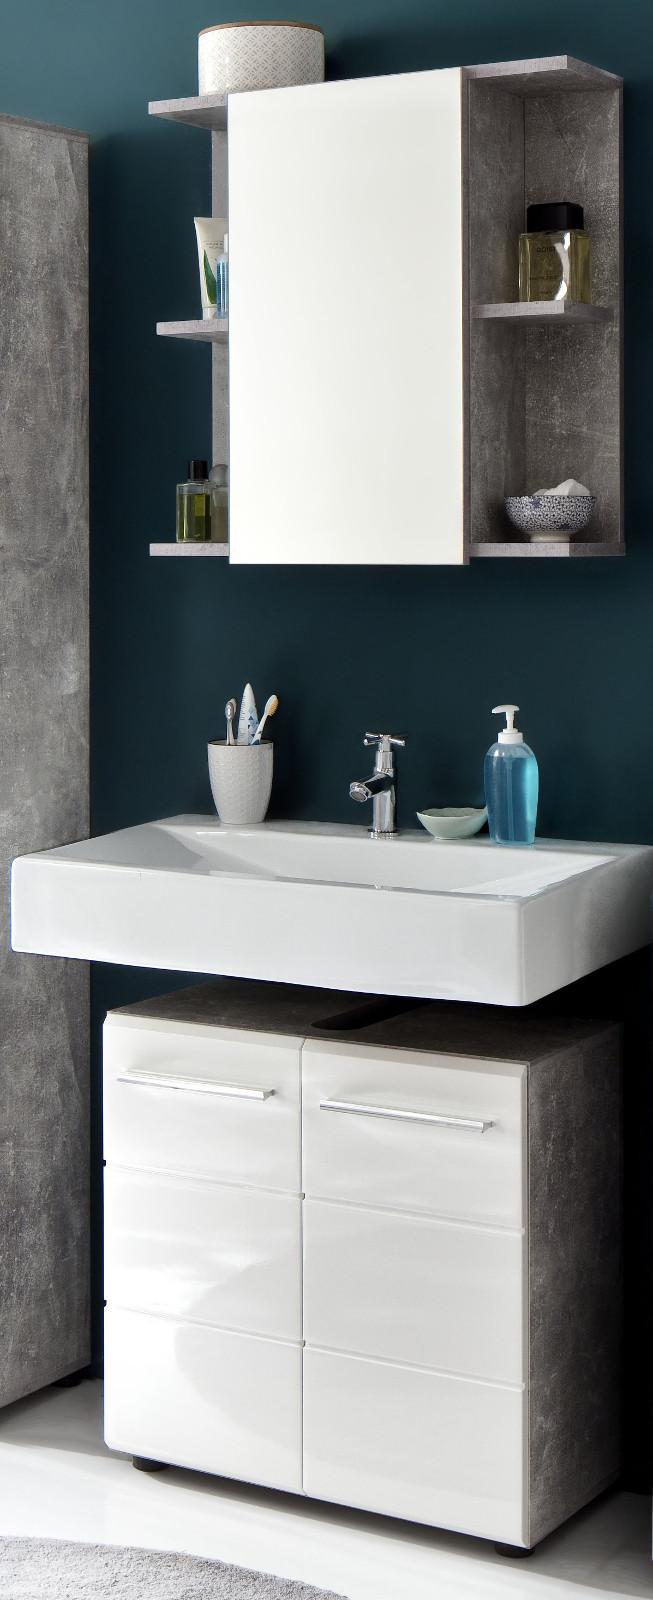 badm bel set nano wei hochglanz und stone grau 2 tlg. Black Bedroom Furniture Sets. Home Design Ideas